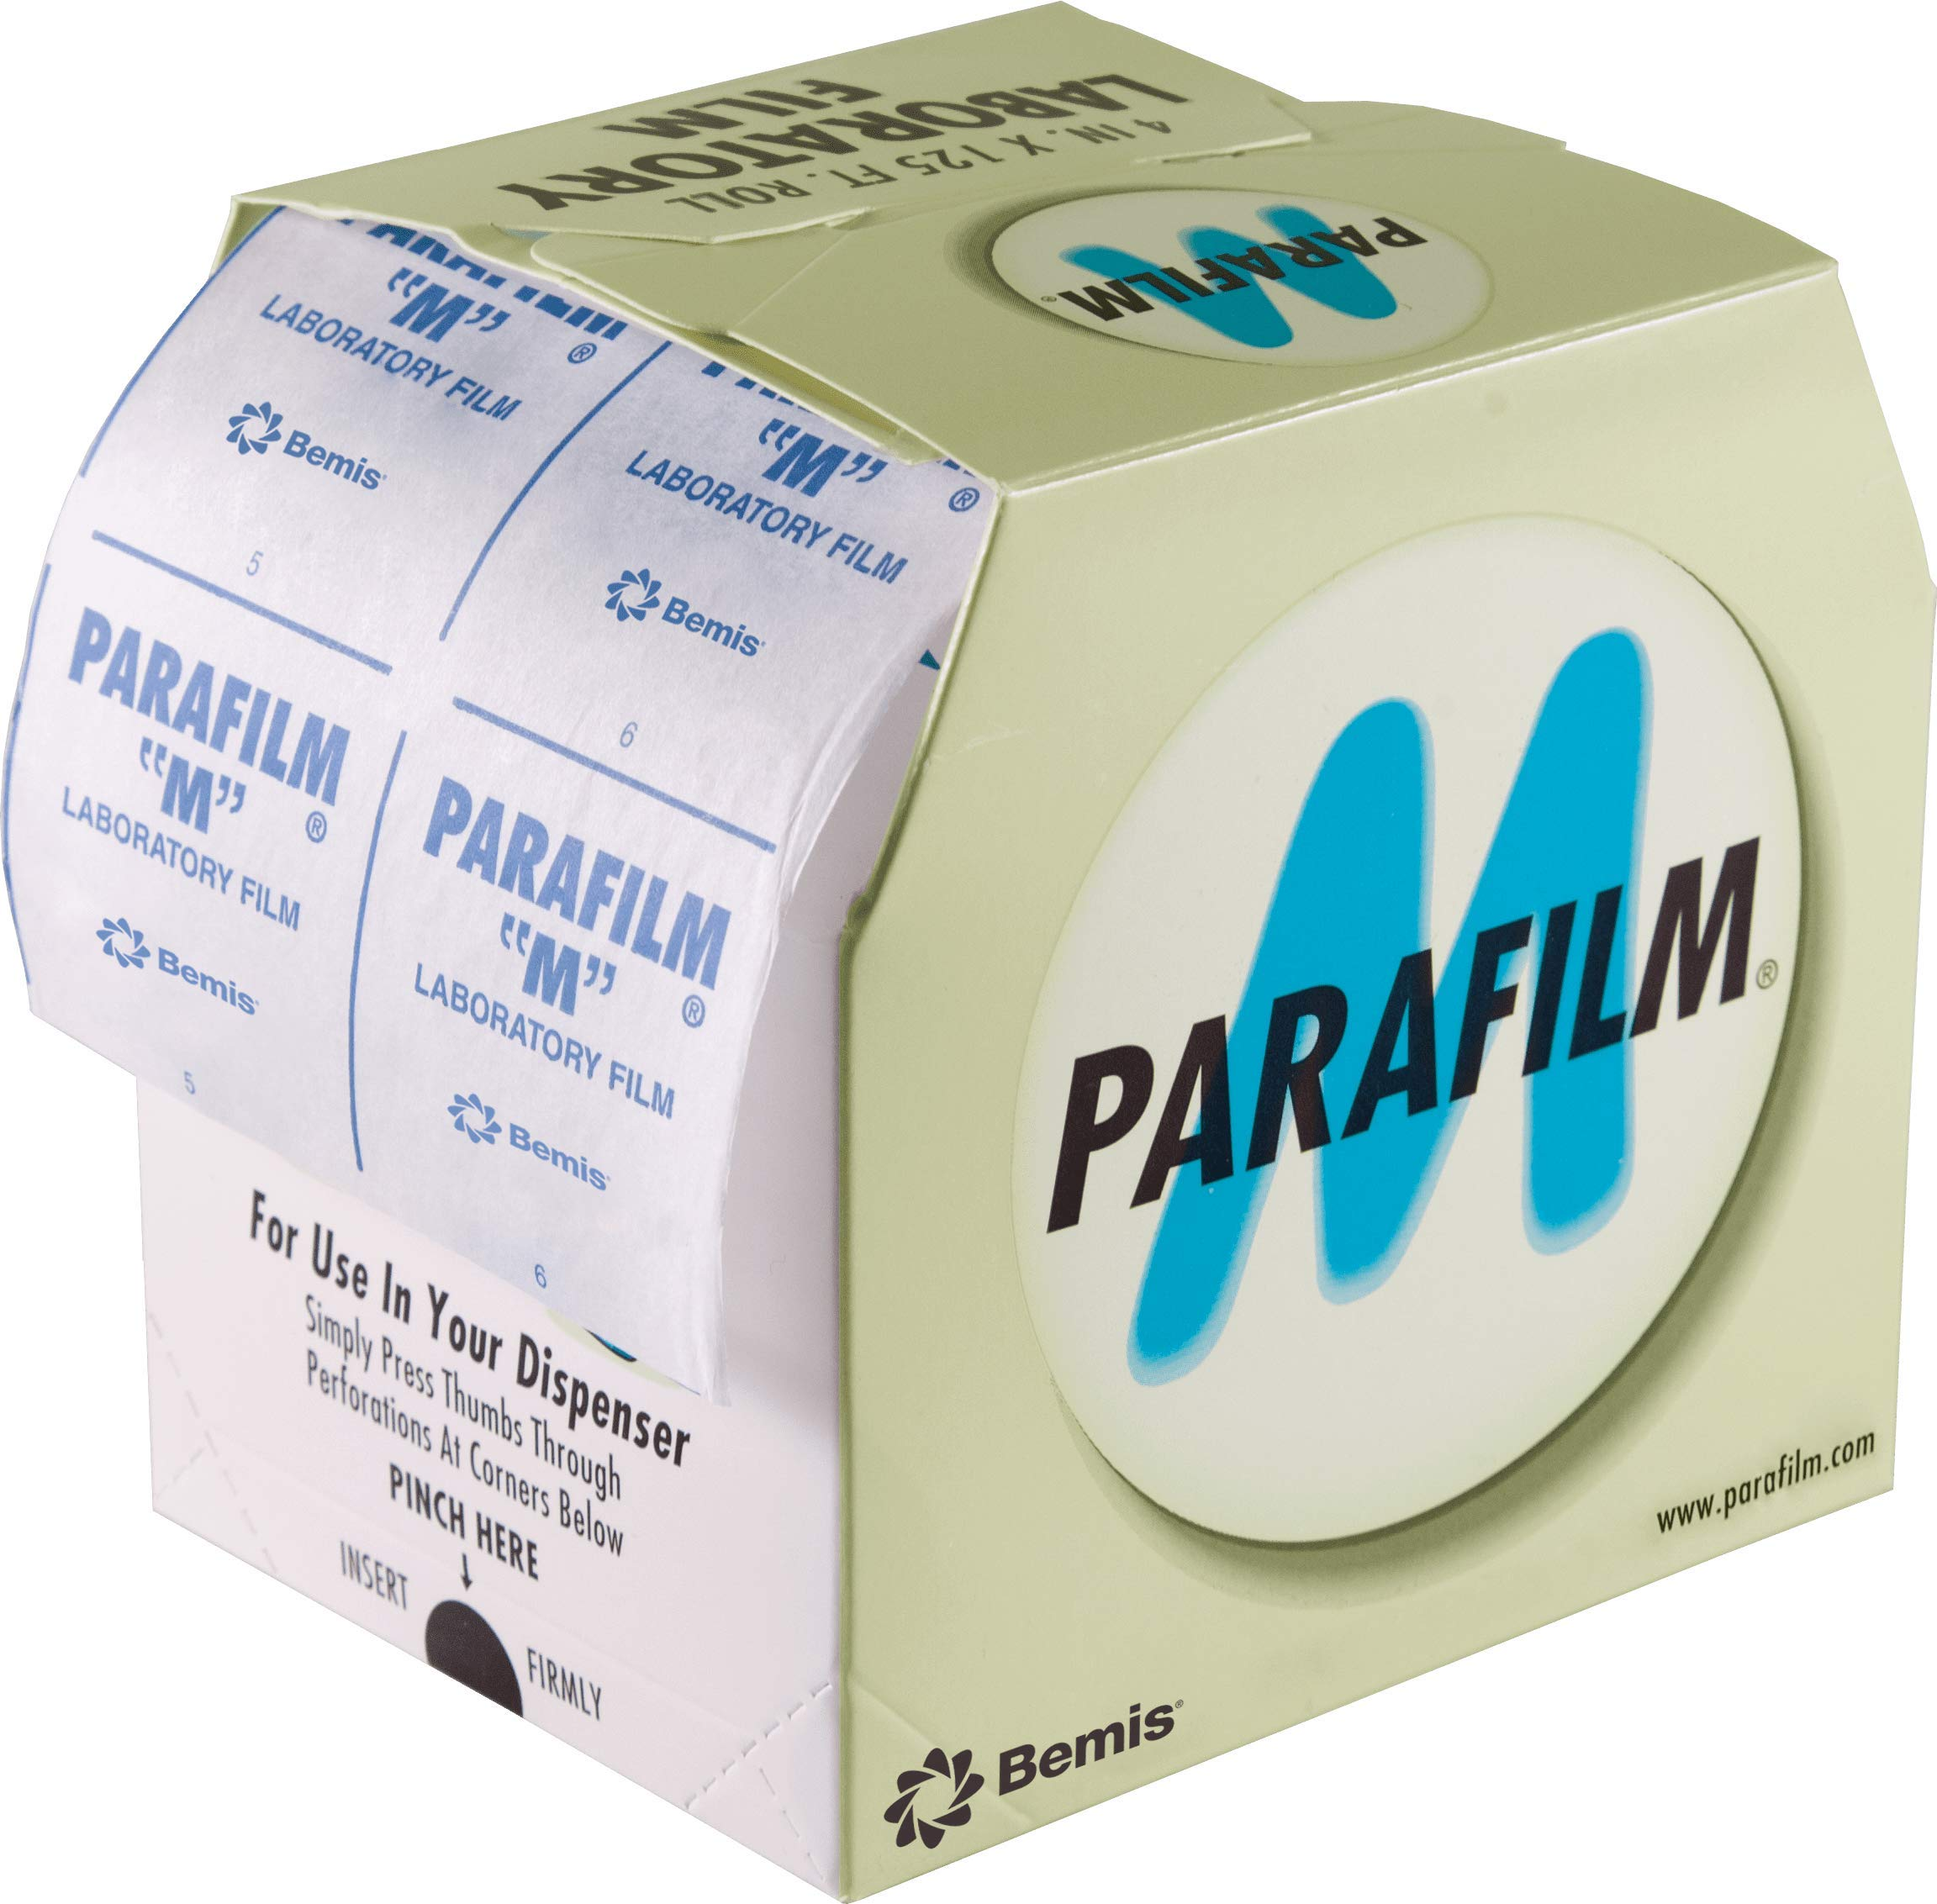 Parafilm M - 5259-04LC PM996 All Purpose Laboratory Film